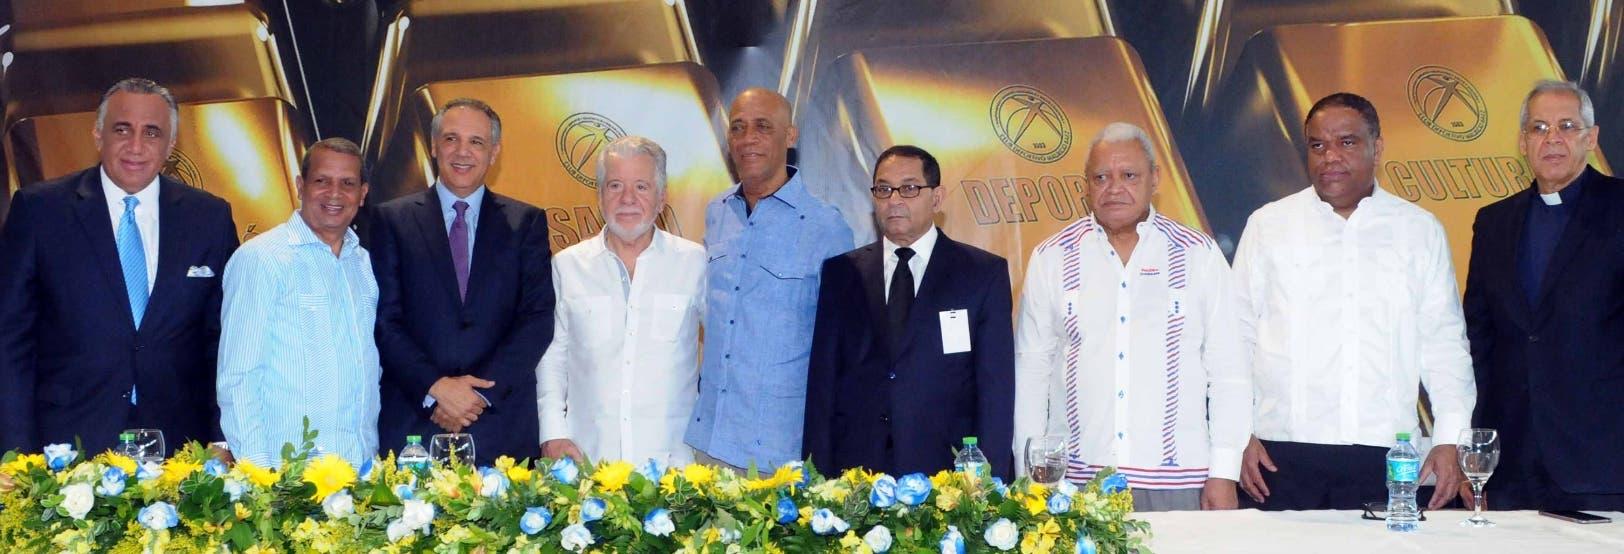 Luisín Mejía, Leo Corporán, José Peralta, Franklin Báez Brugal, José Domínguez Mariano Germán, Nelly Doñé, Danilo Díaz y  JoséPastor.